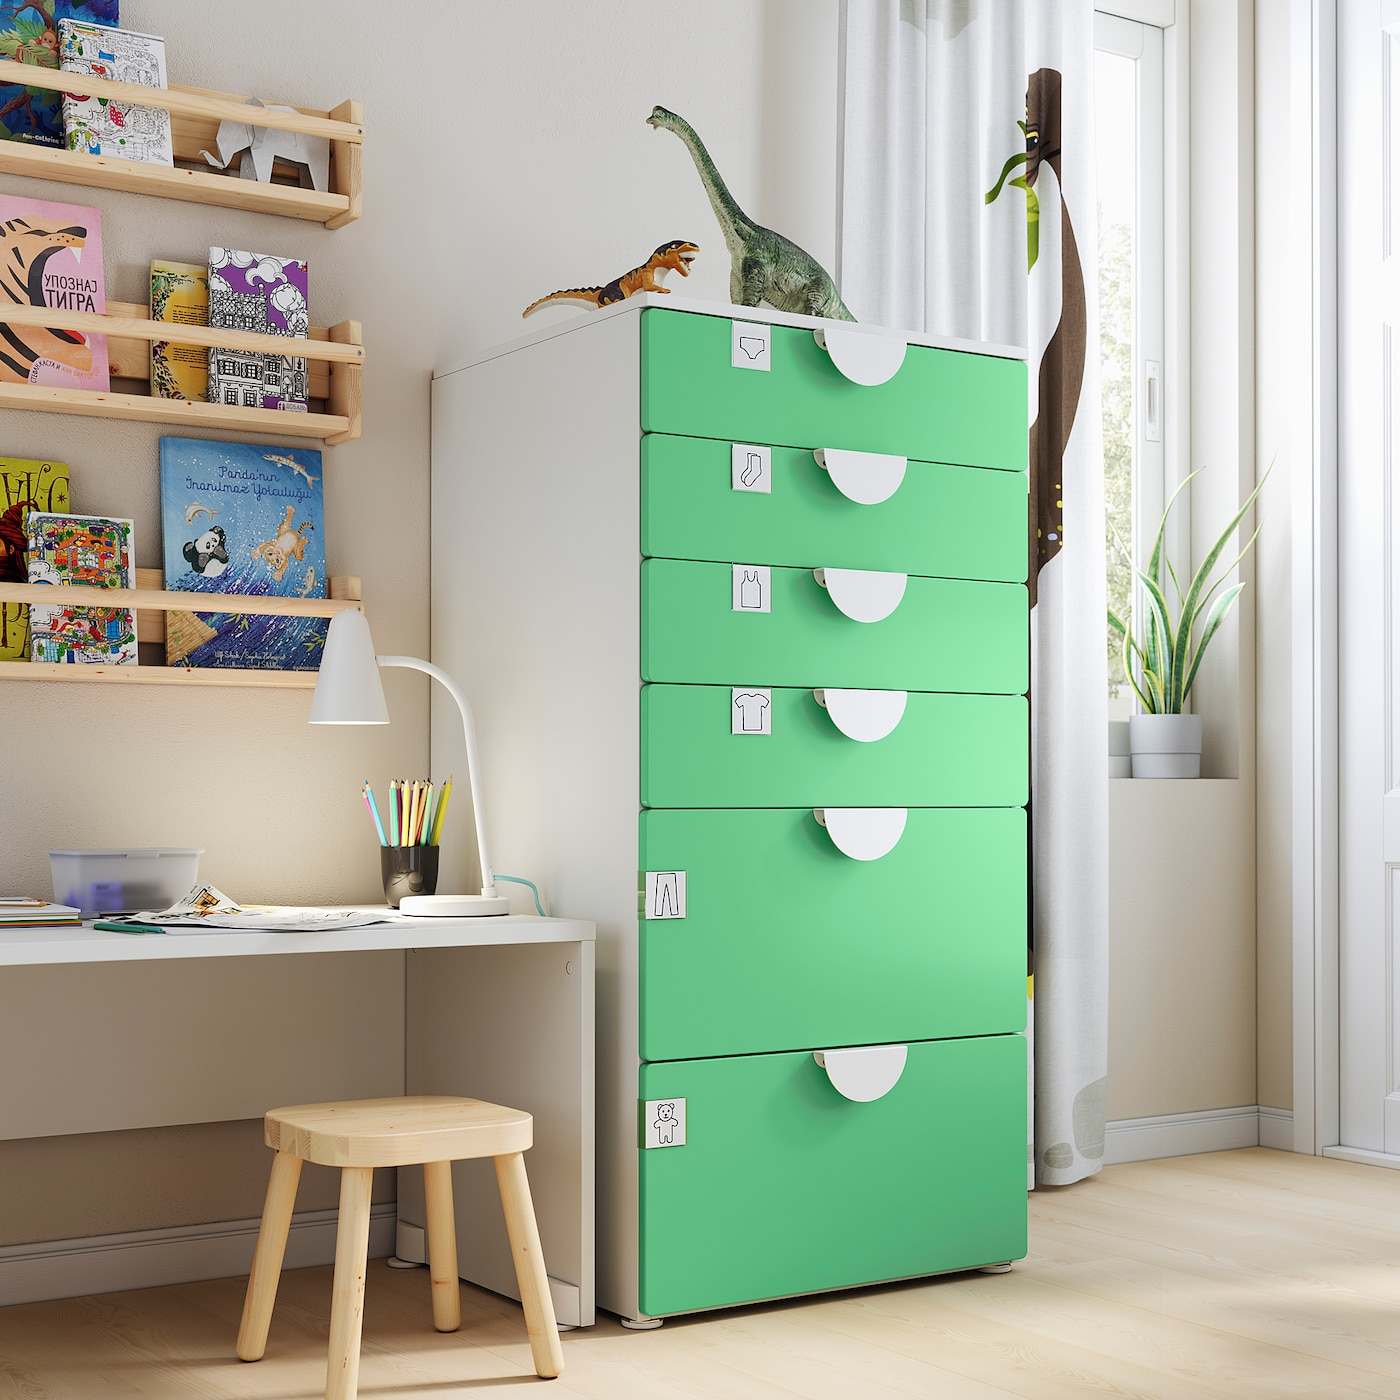 SMÅSTAD / PLATSA Ladekast 6 lades, wit/groen, 60x57x123 cm